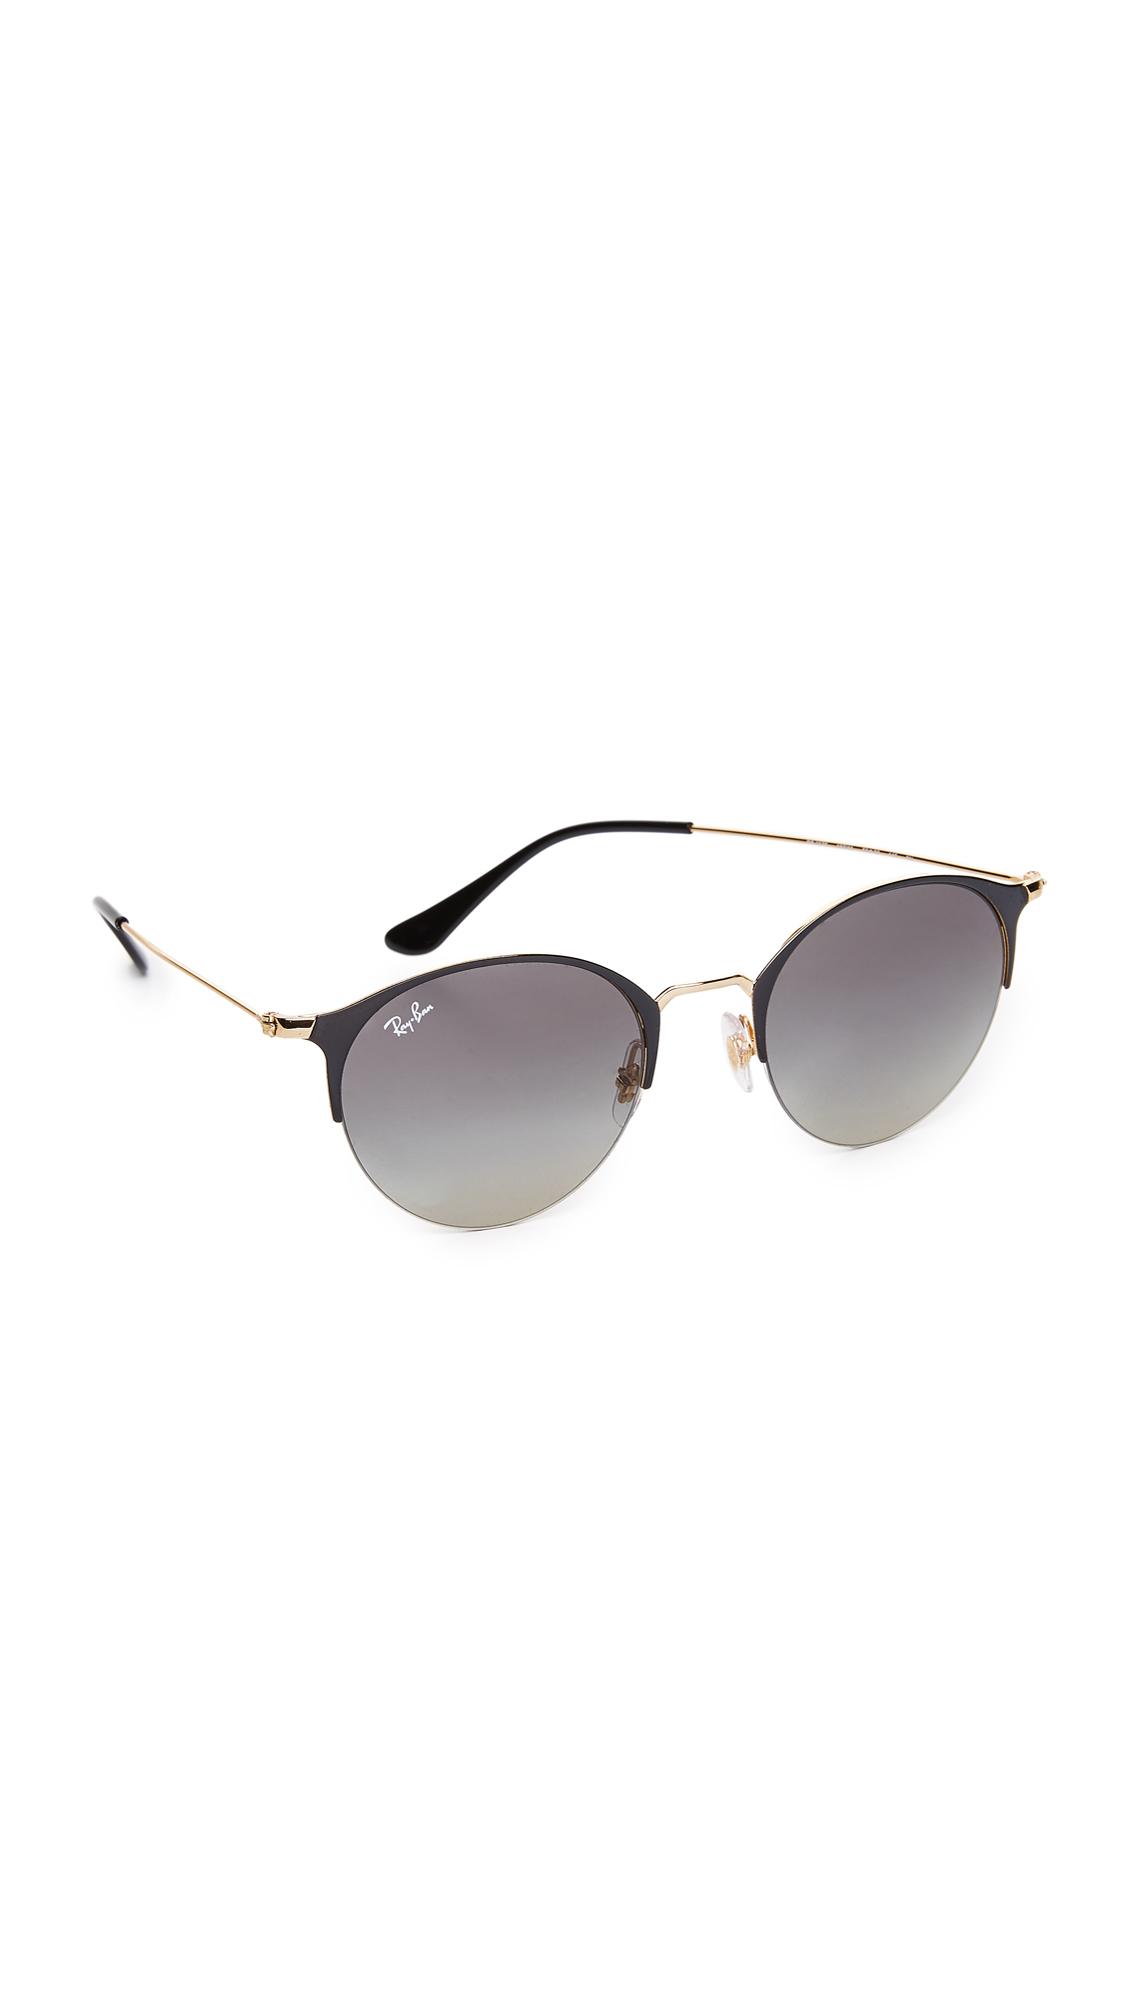 Ray-Ban Phantos Round Semi Rimless Sunglasses In Black/Grey